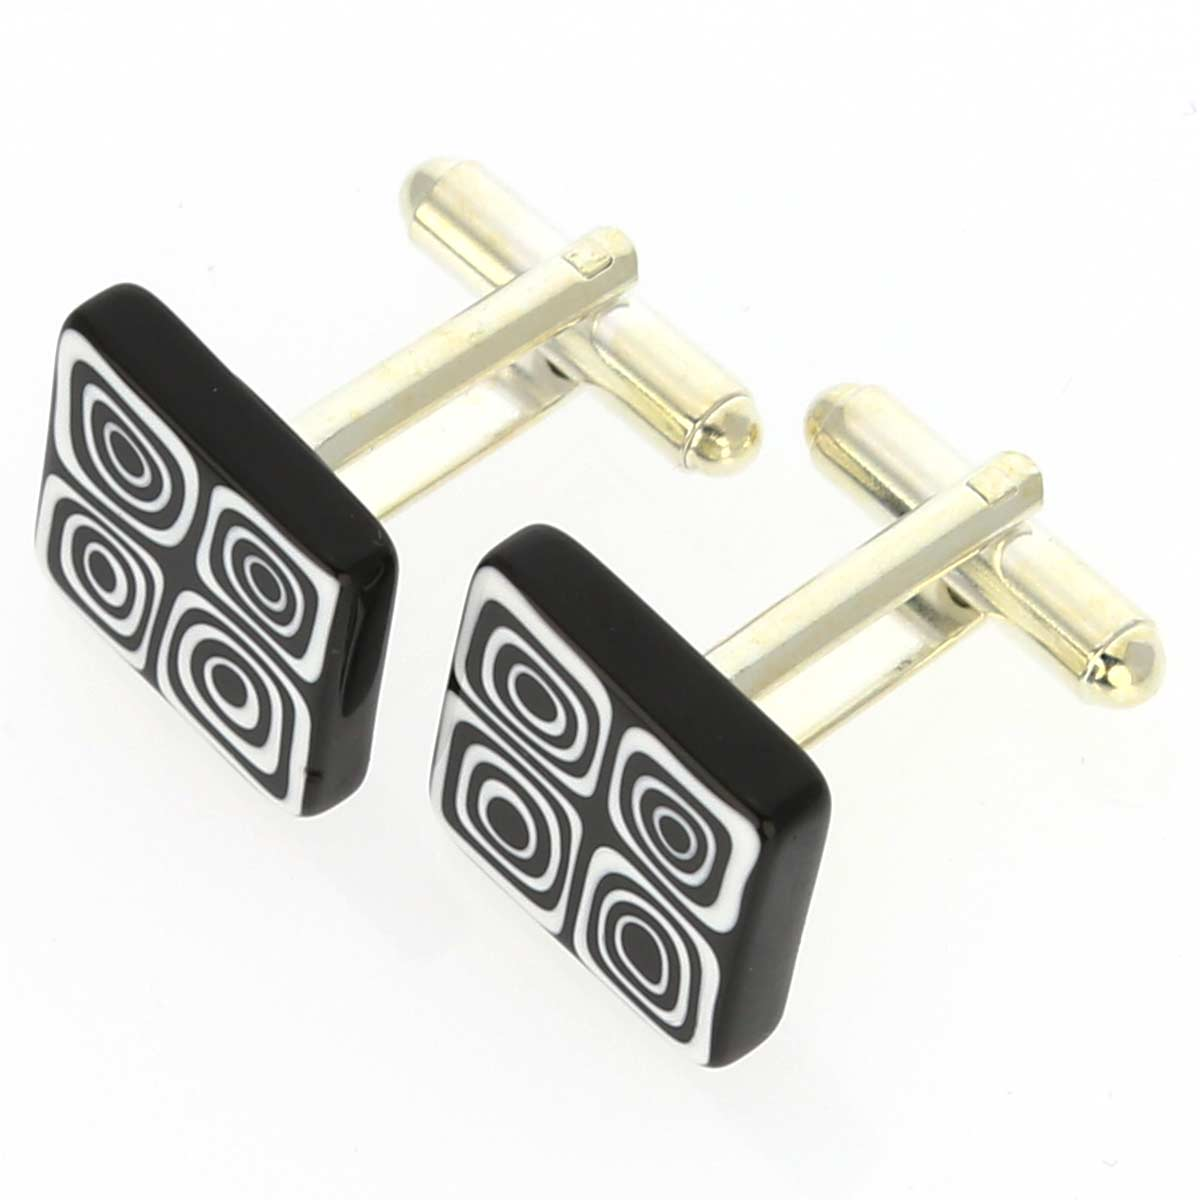 Murano Millefiori Square Cufflinks - Black and White